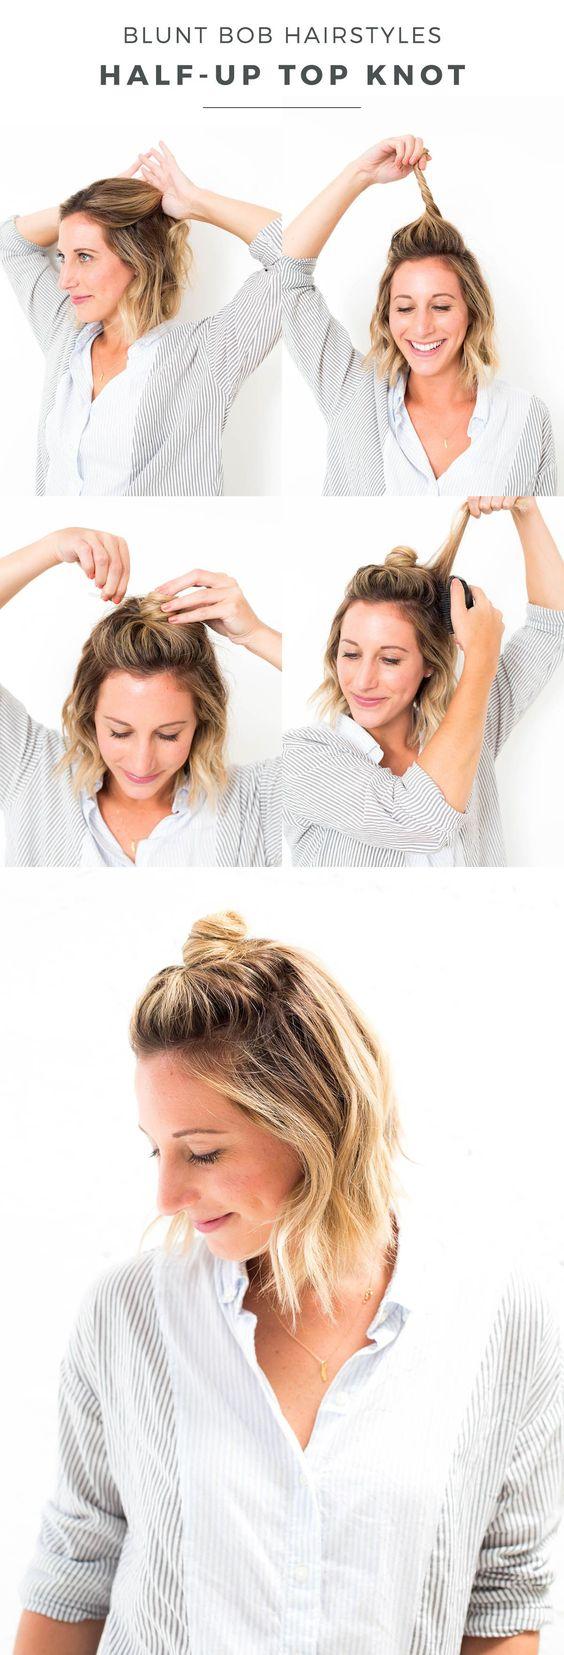 blunt bob half-up top knot hair tutorial, blunt bob hairstyle, short hair style, blunt bob haircut, short layers